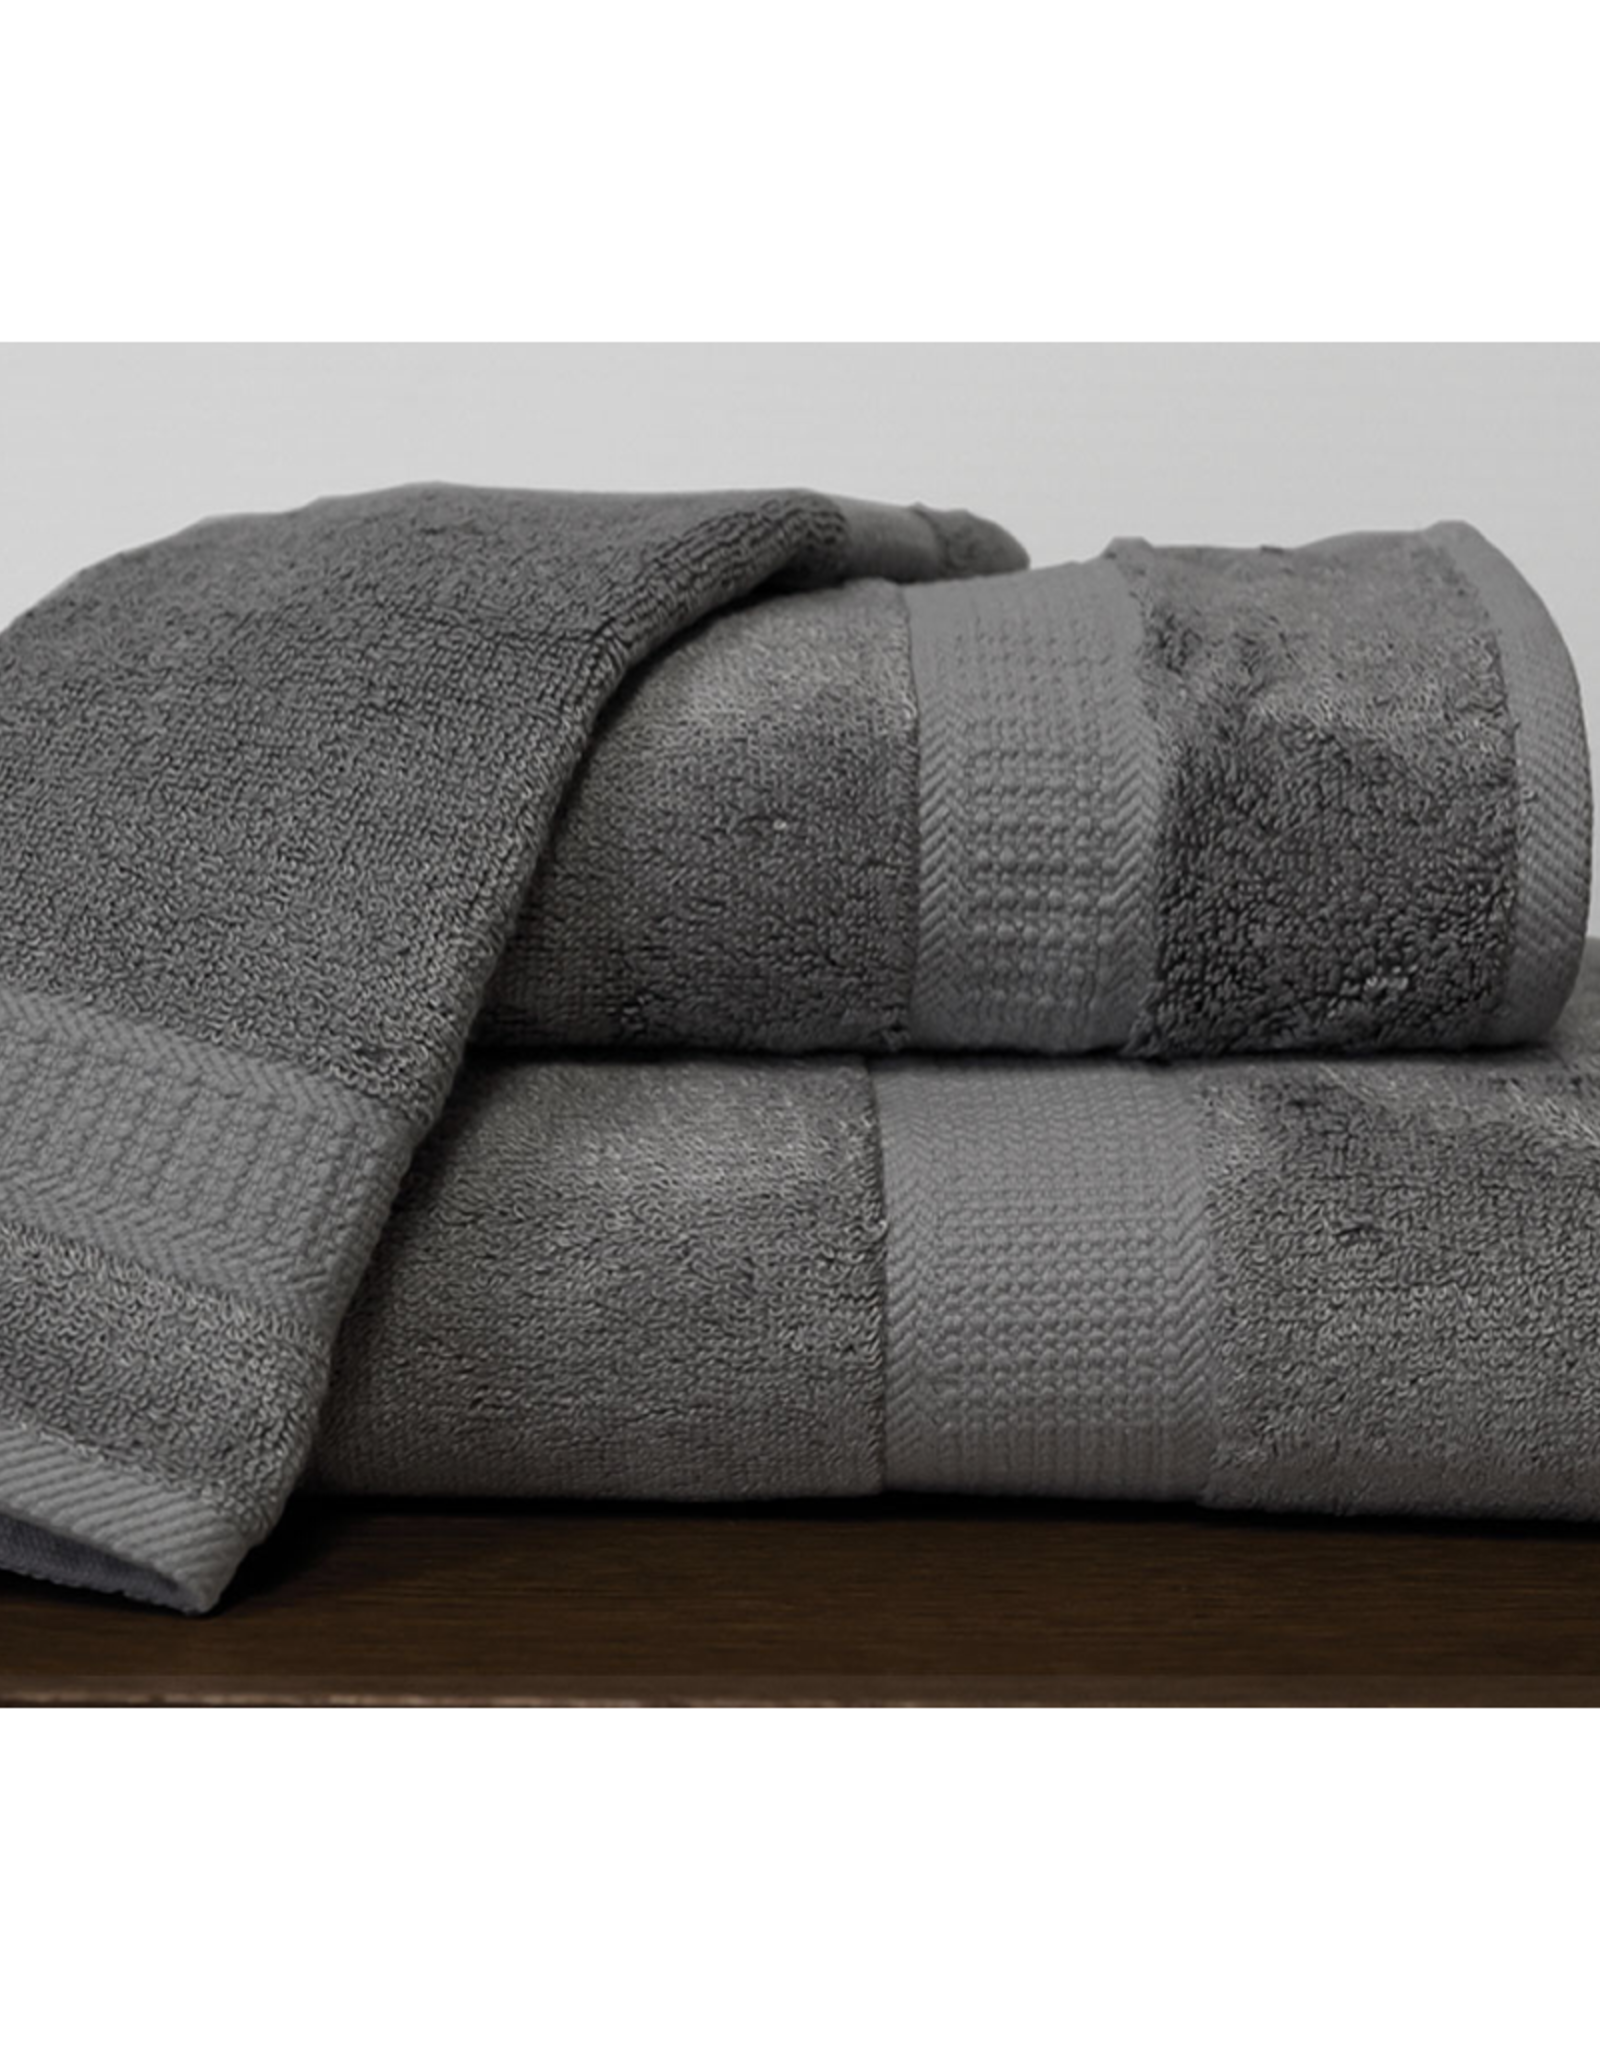 Alamode Home Bath Towel RJS Bamboo Charcoal